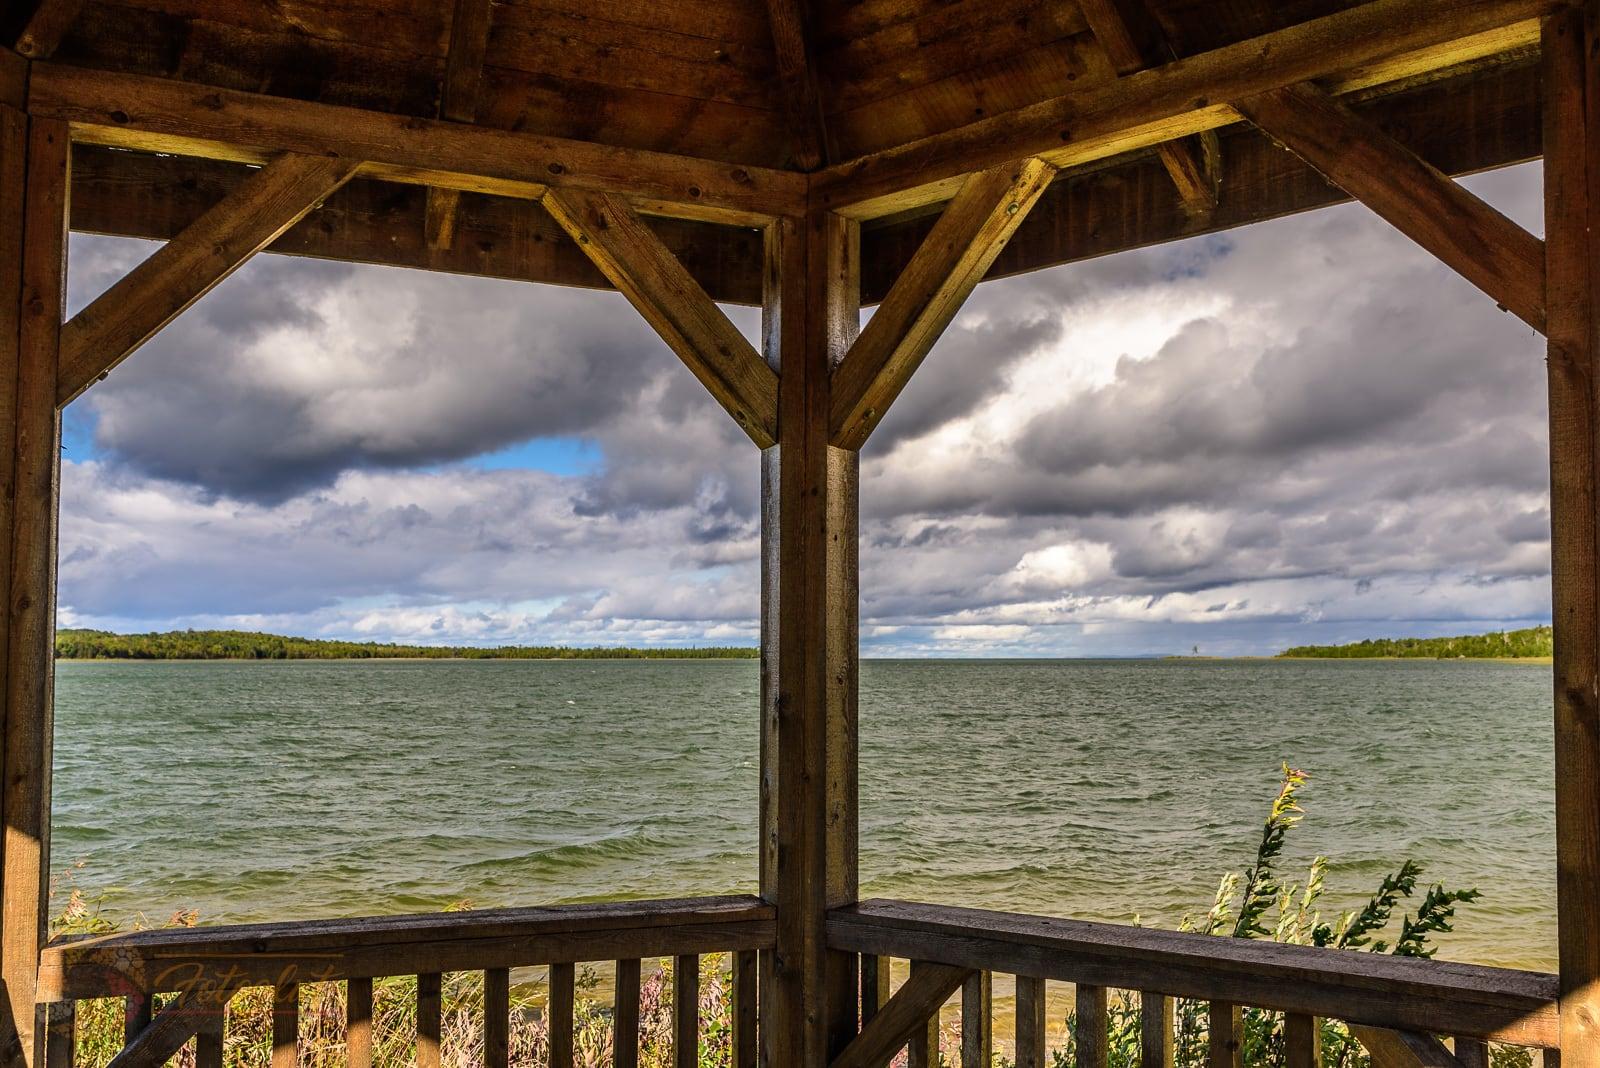 Pavillon am Julia Bay auf Manitoulin Island (Kanada) - Foto: Michael Stollmann